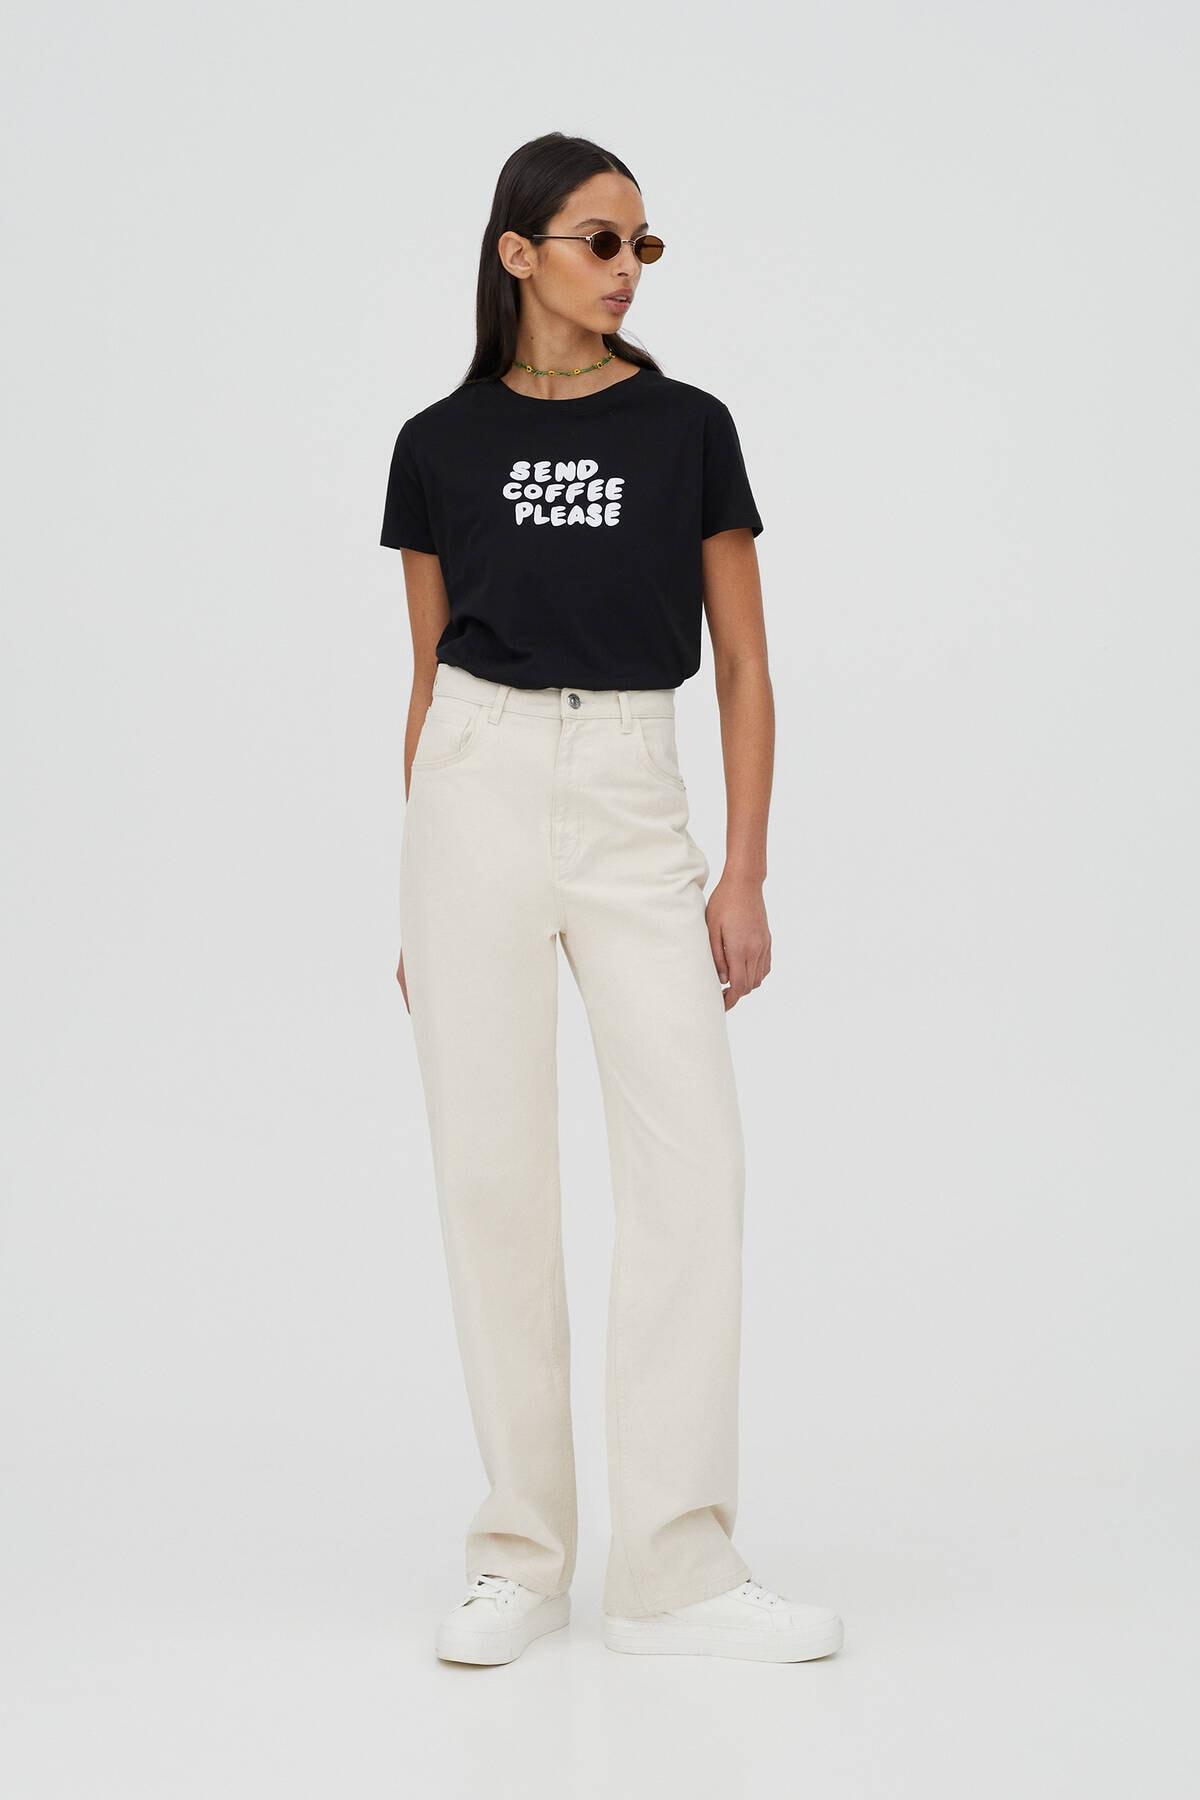 Pull & Bear Kadın Kontrast Sloganlı Siyah T-Shirt - %100 Organik Pamuklu 04240310 1